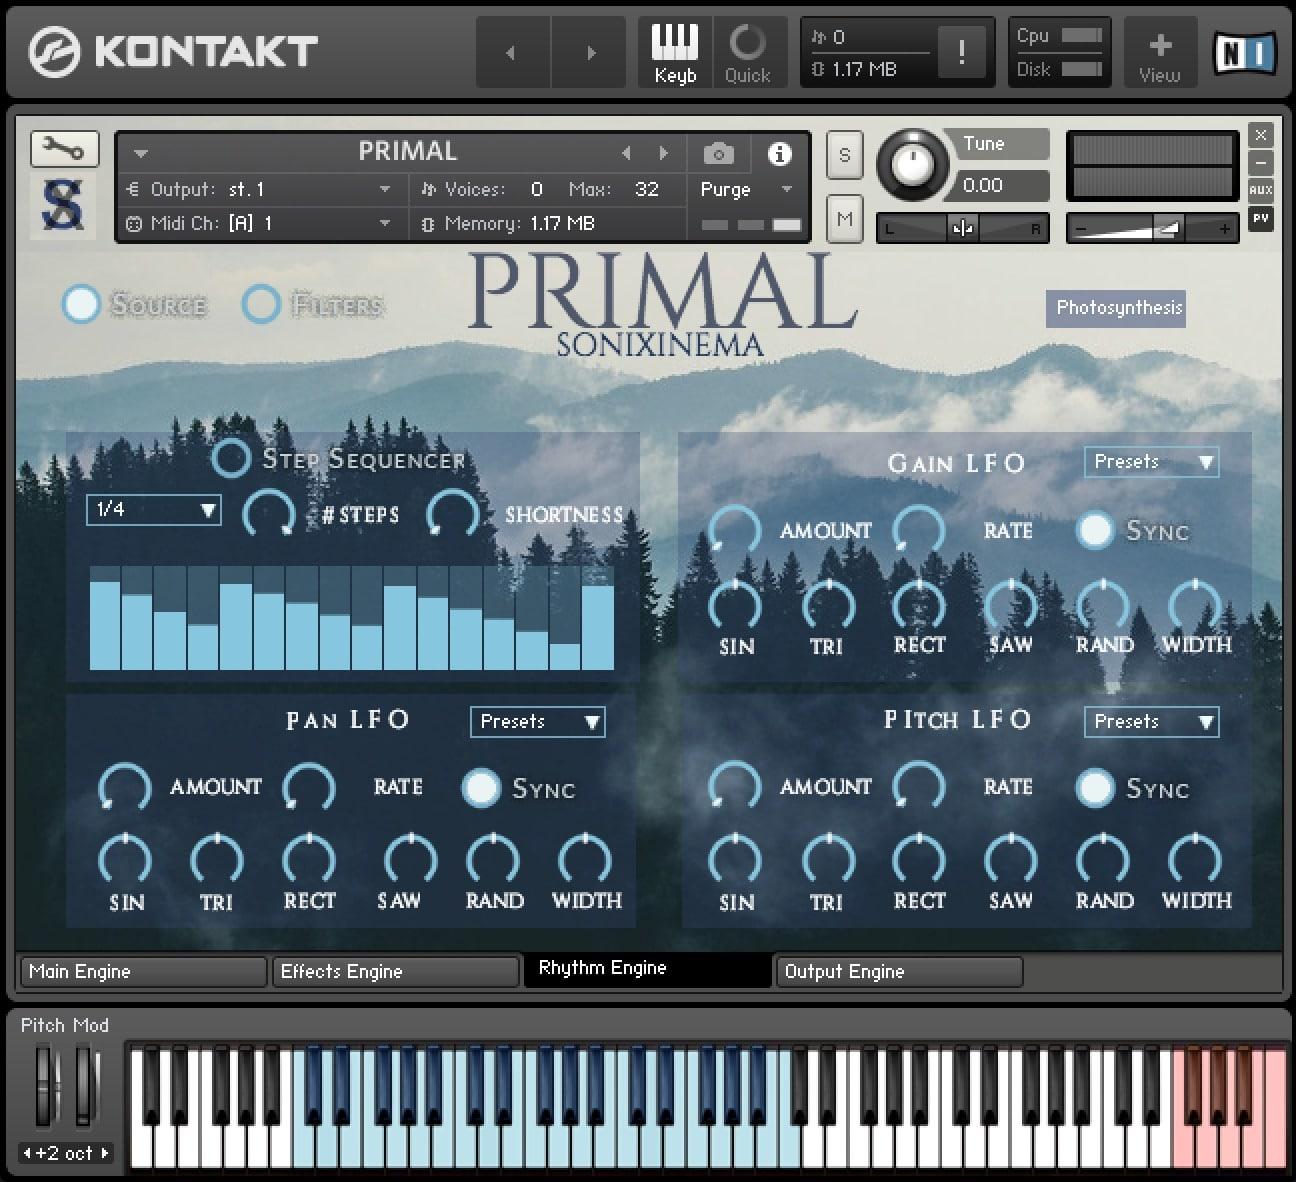 sonixinema-primal-3-rhythm-engine